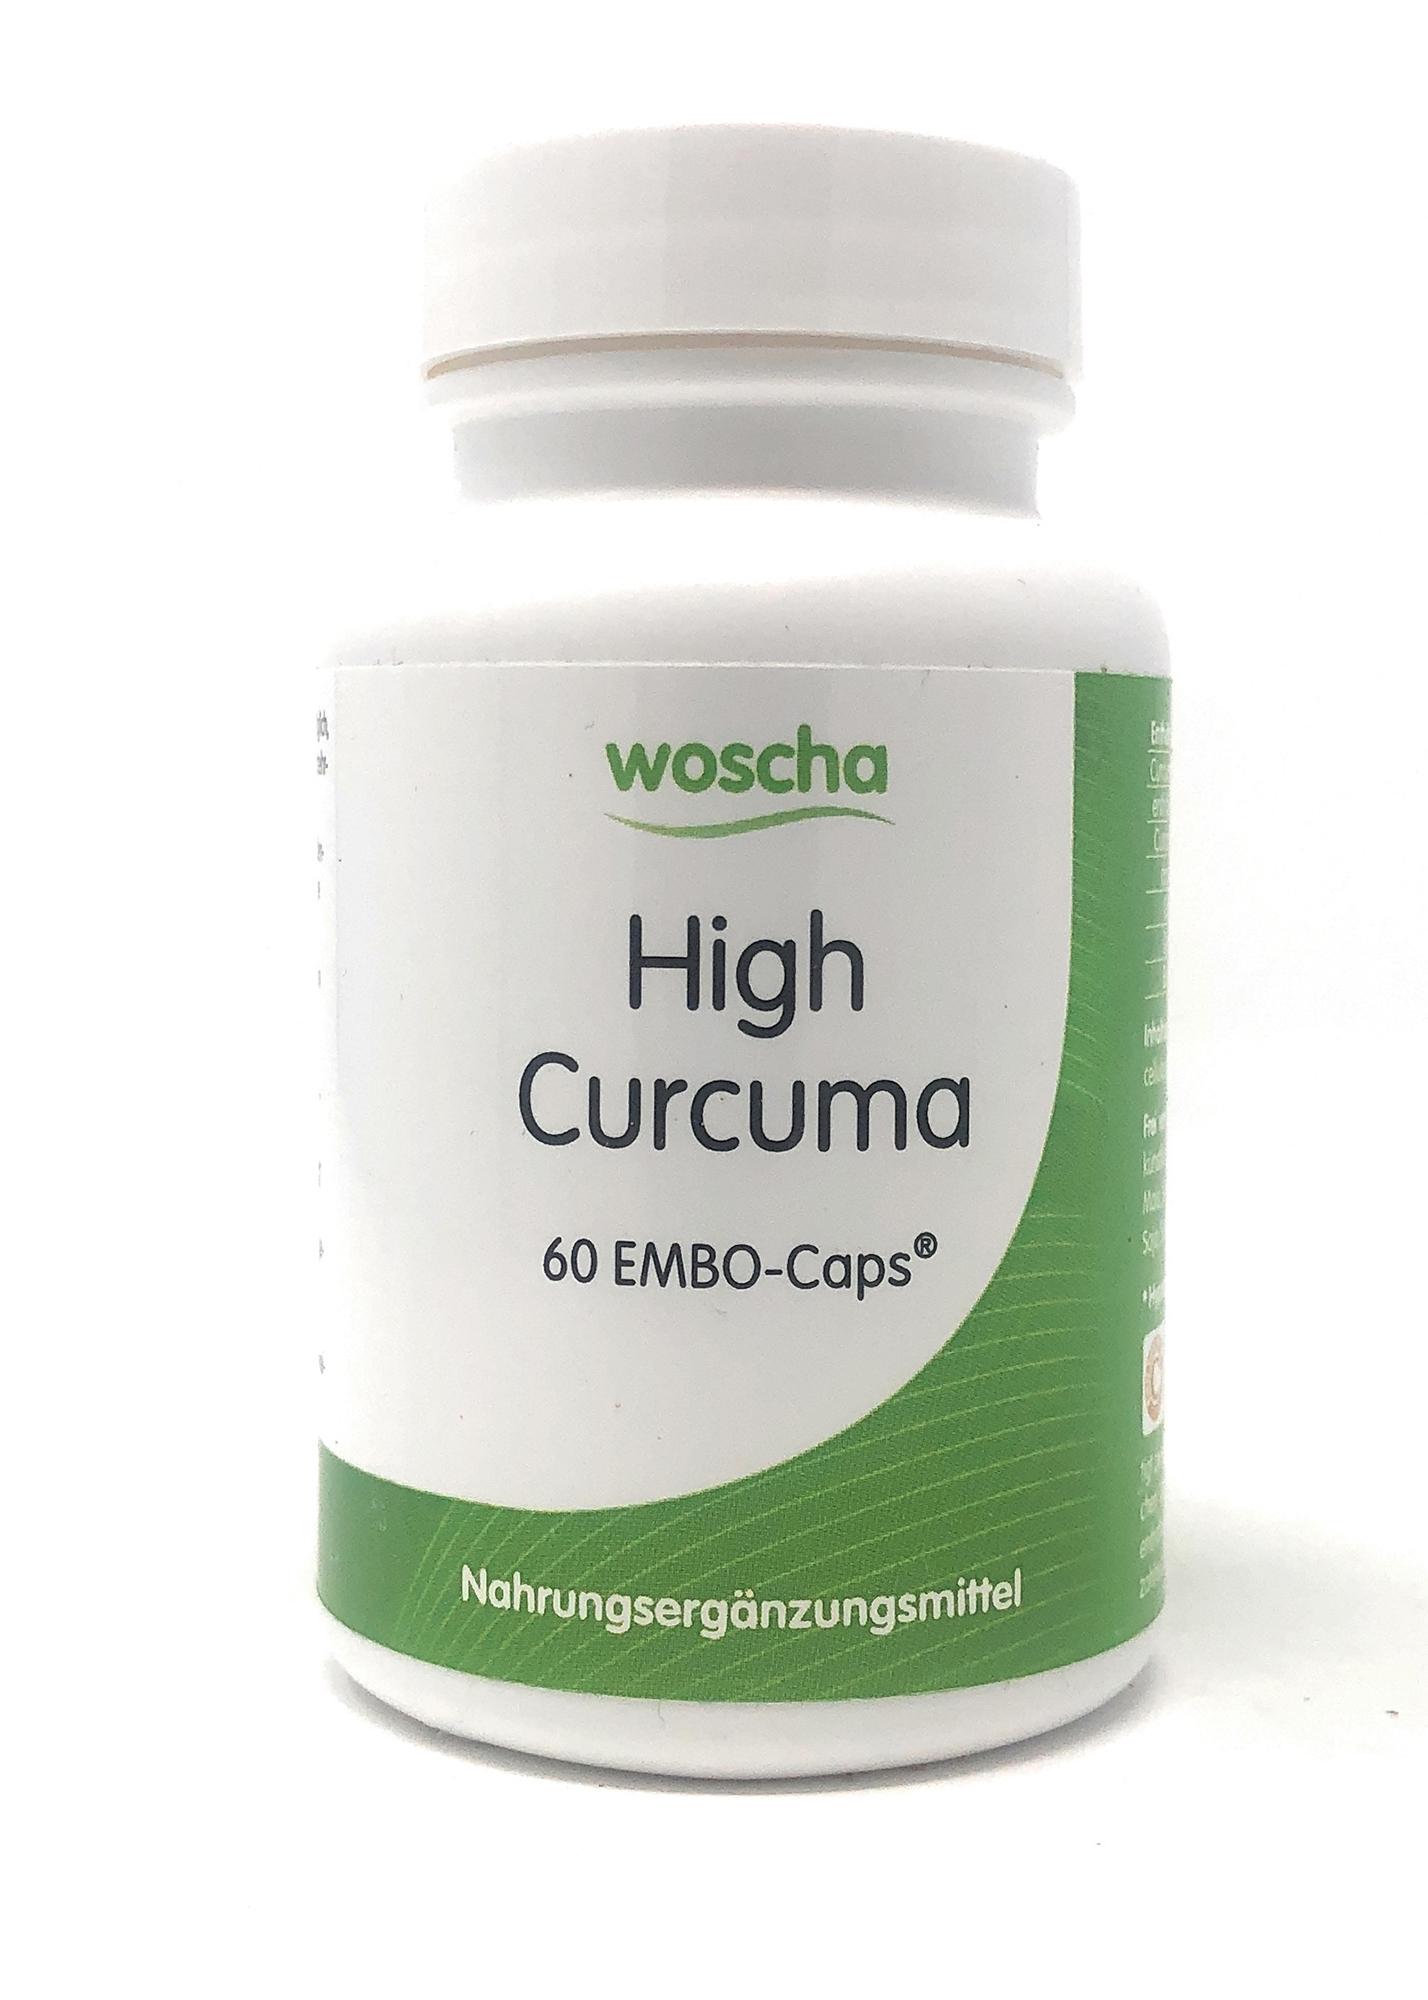 woscha High Curcuma 60 Embo-CAPS® (29g) (vegan)